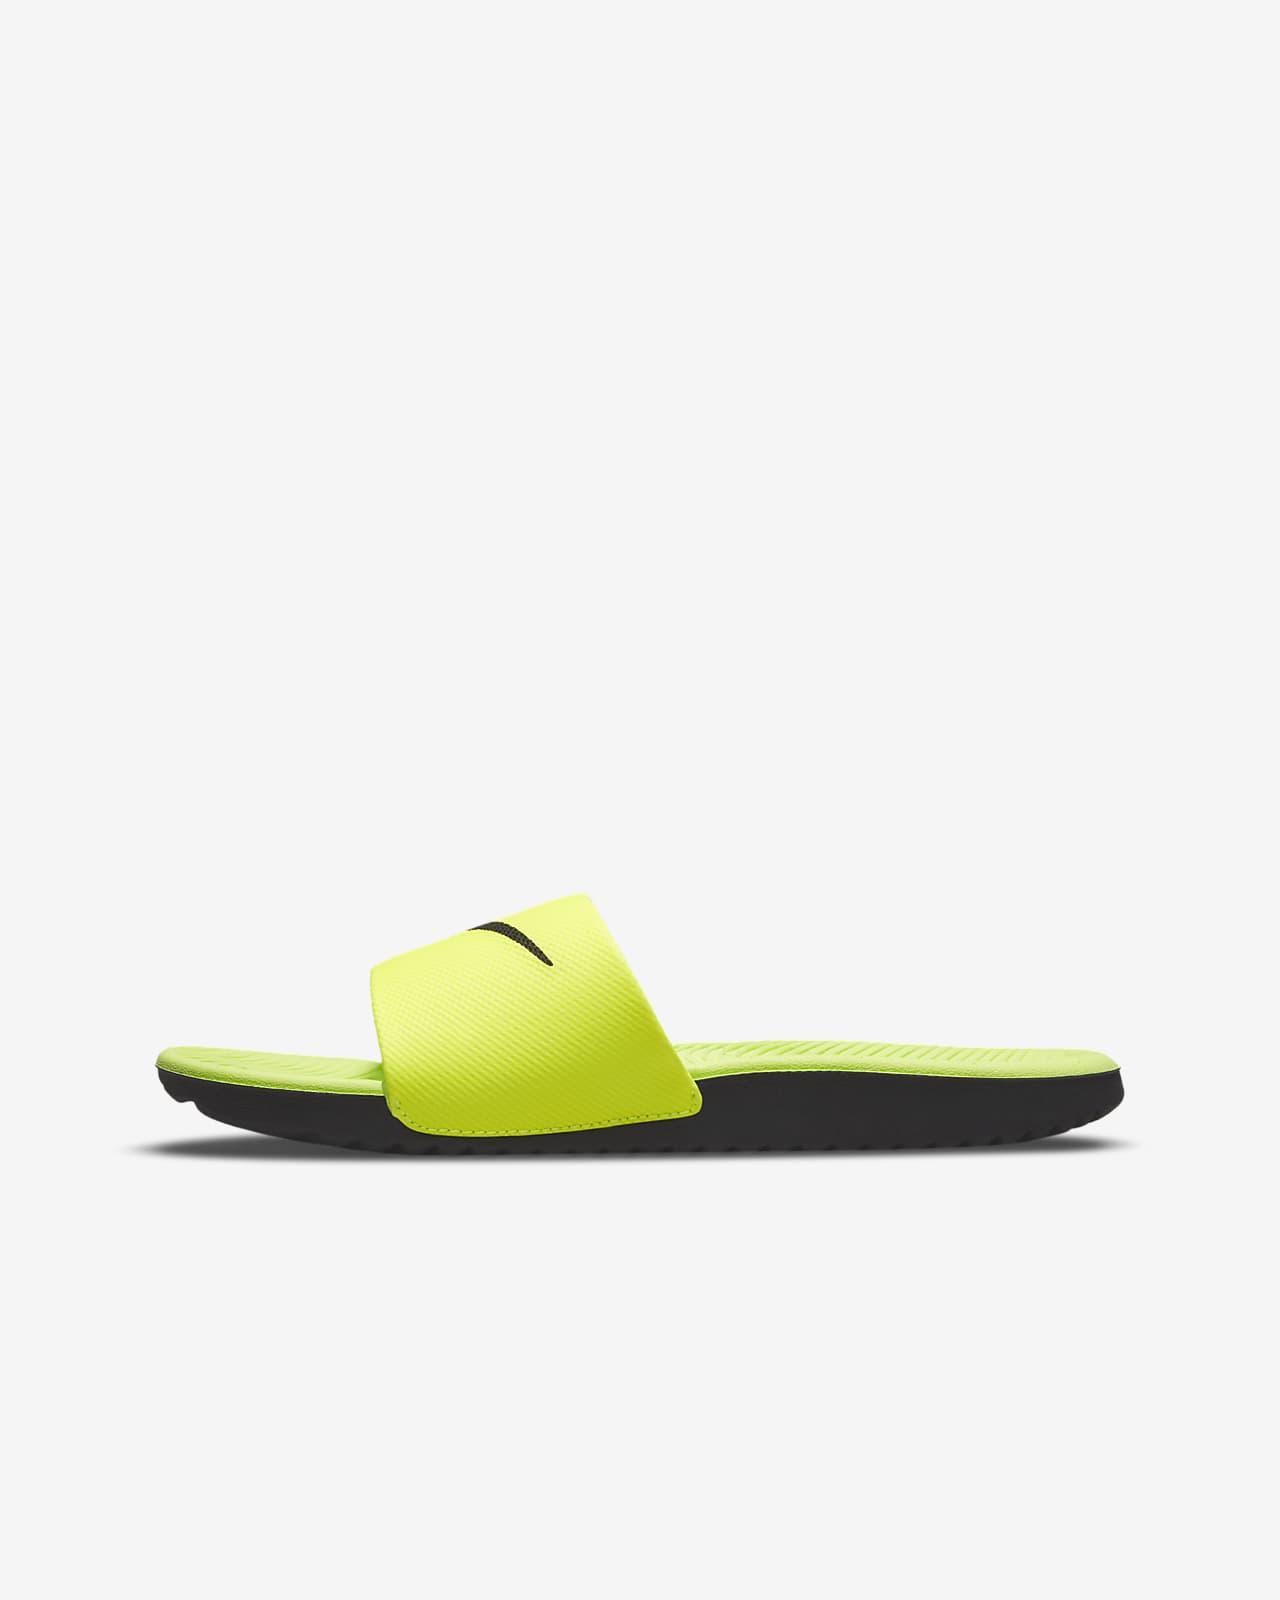 big 5 nike sandals